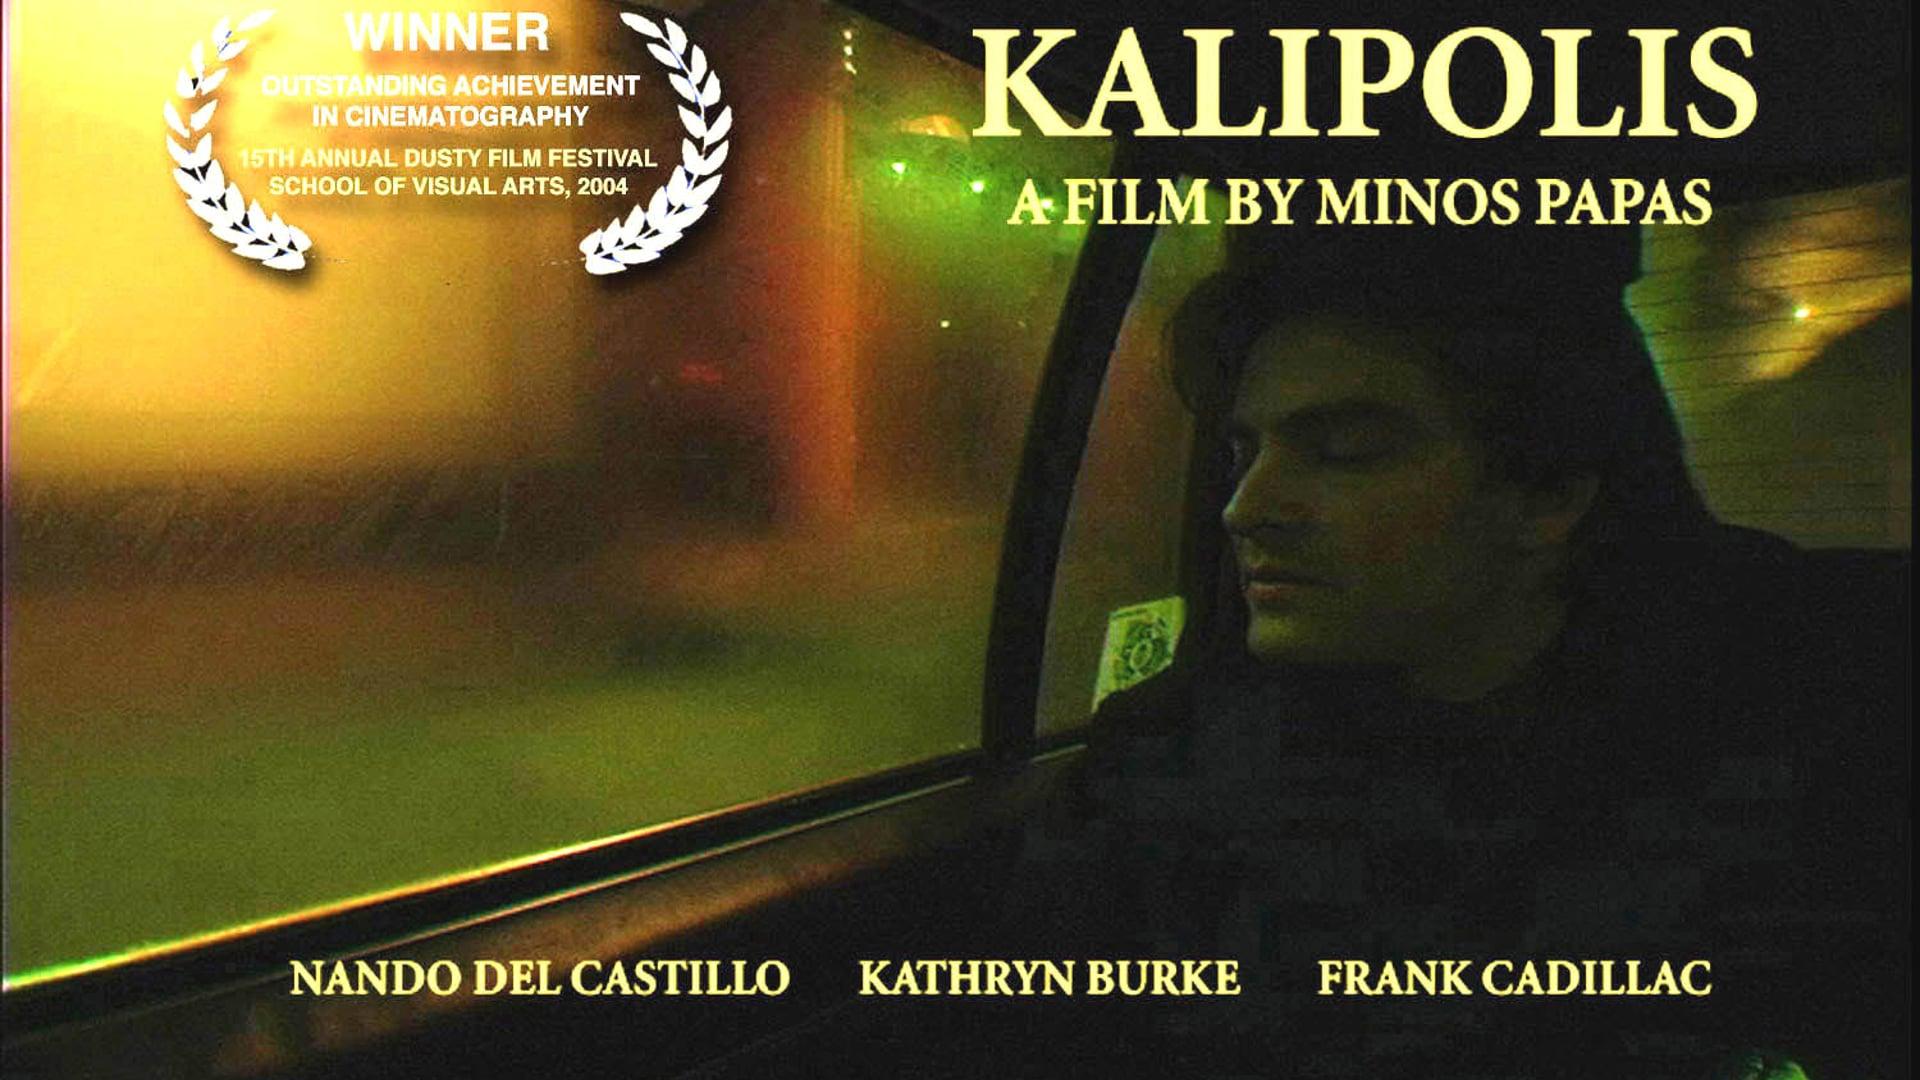 Kalipolis